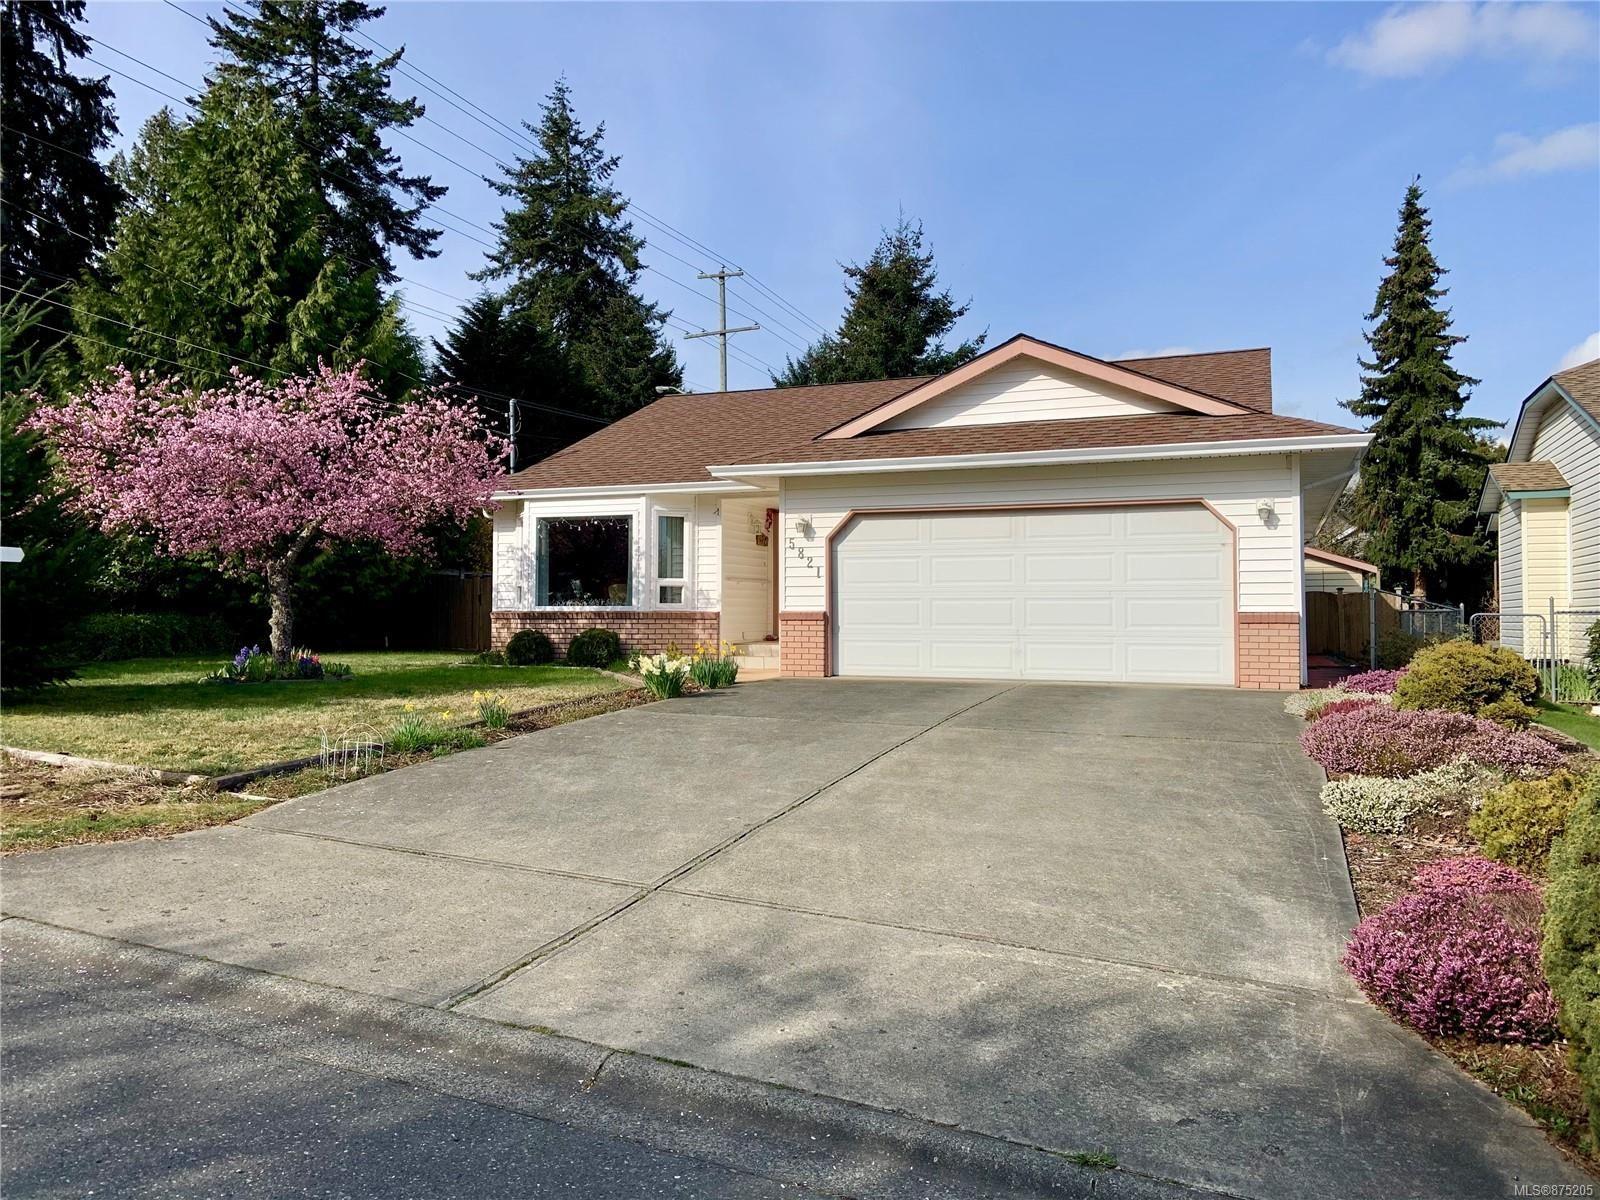 Main Photo: 5821 Brigantine Dr in : Na North Nanaimo House for sale (Nanaimo)  : MLS®# 875205